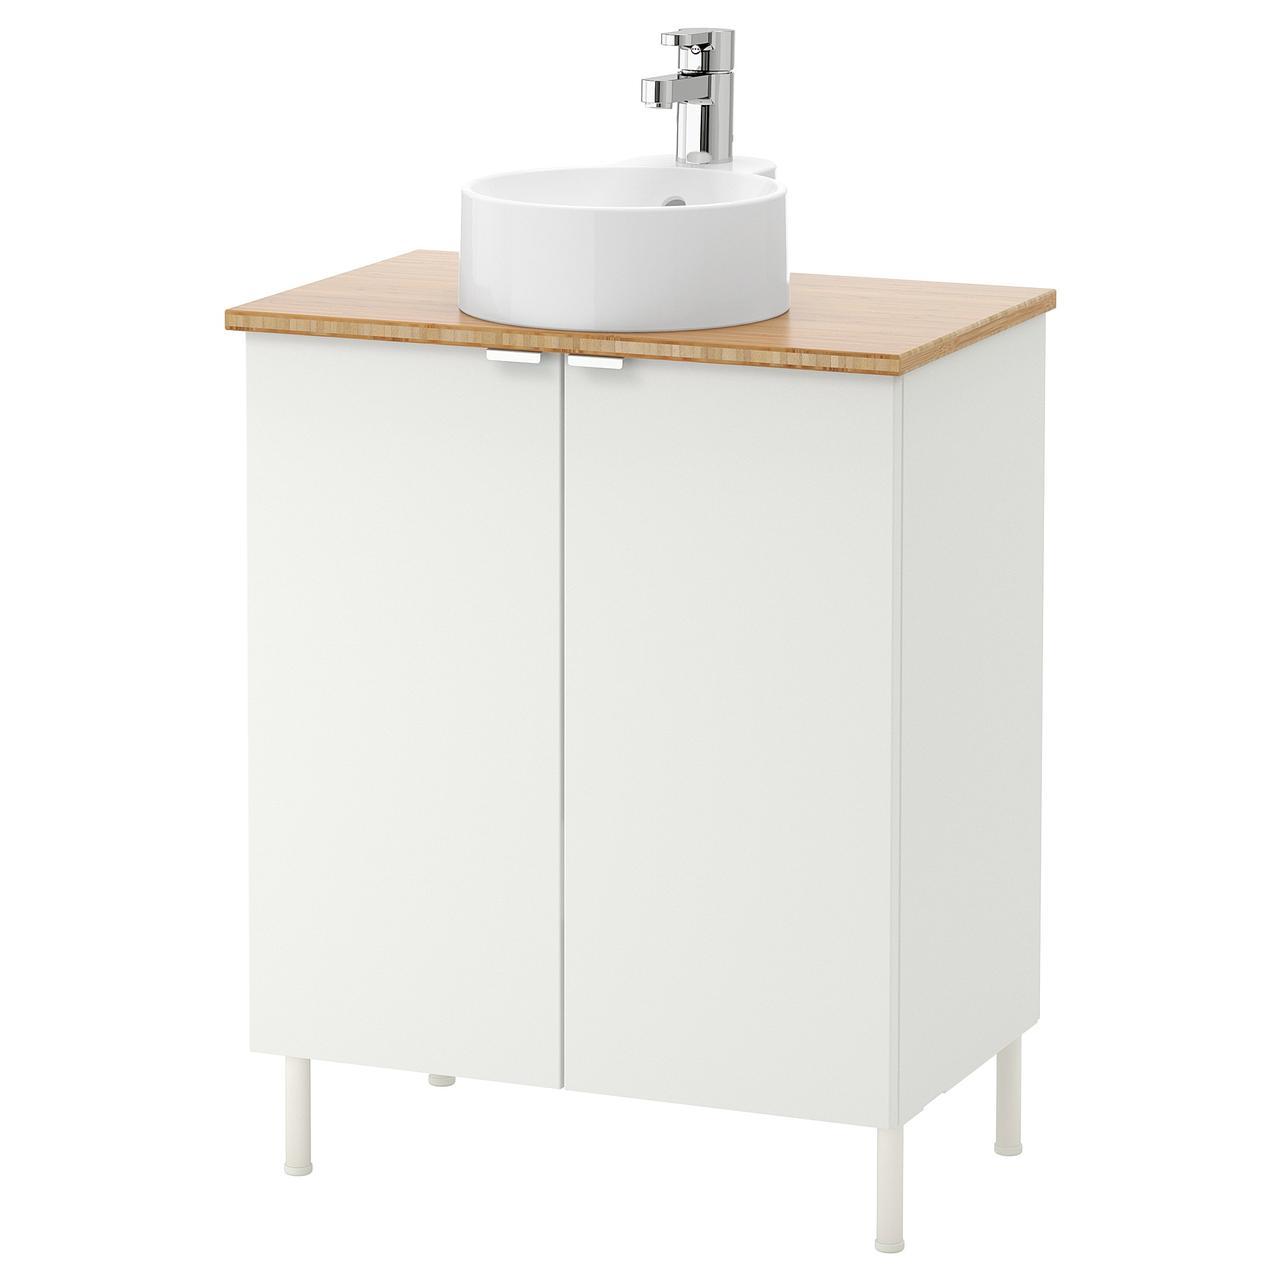 ЛИЛЛОНГЕН/ВИСКАН / ГУТВИКЕН Шкаф под раковину с 2 дверц, белый, бледно-зеленый